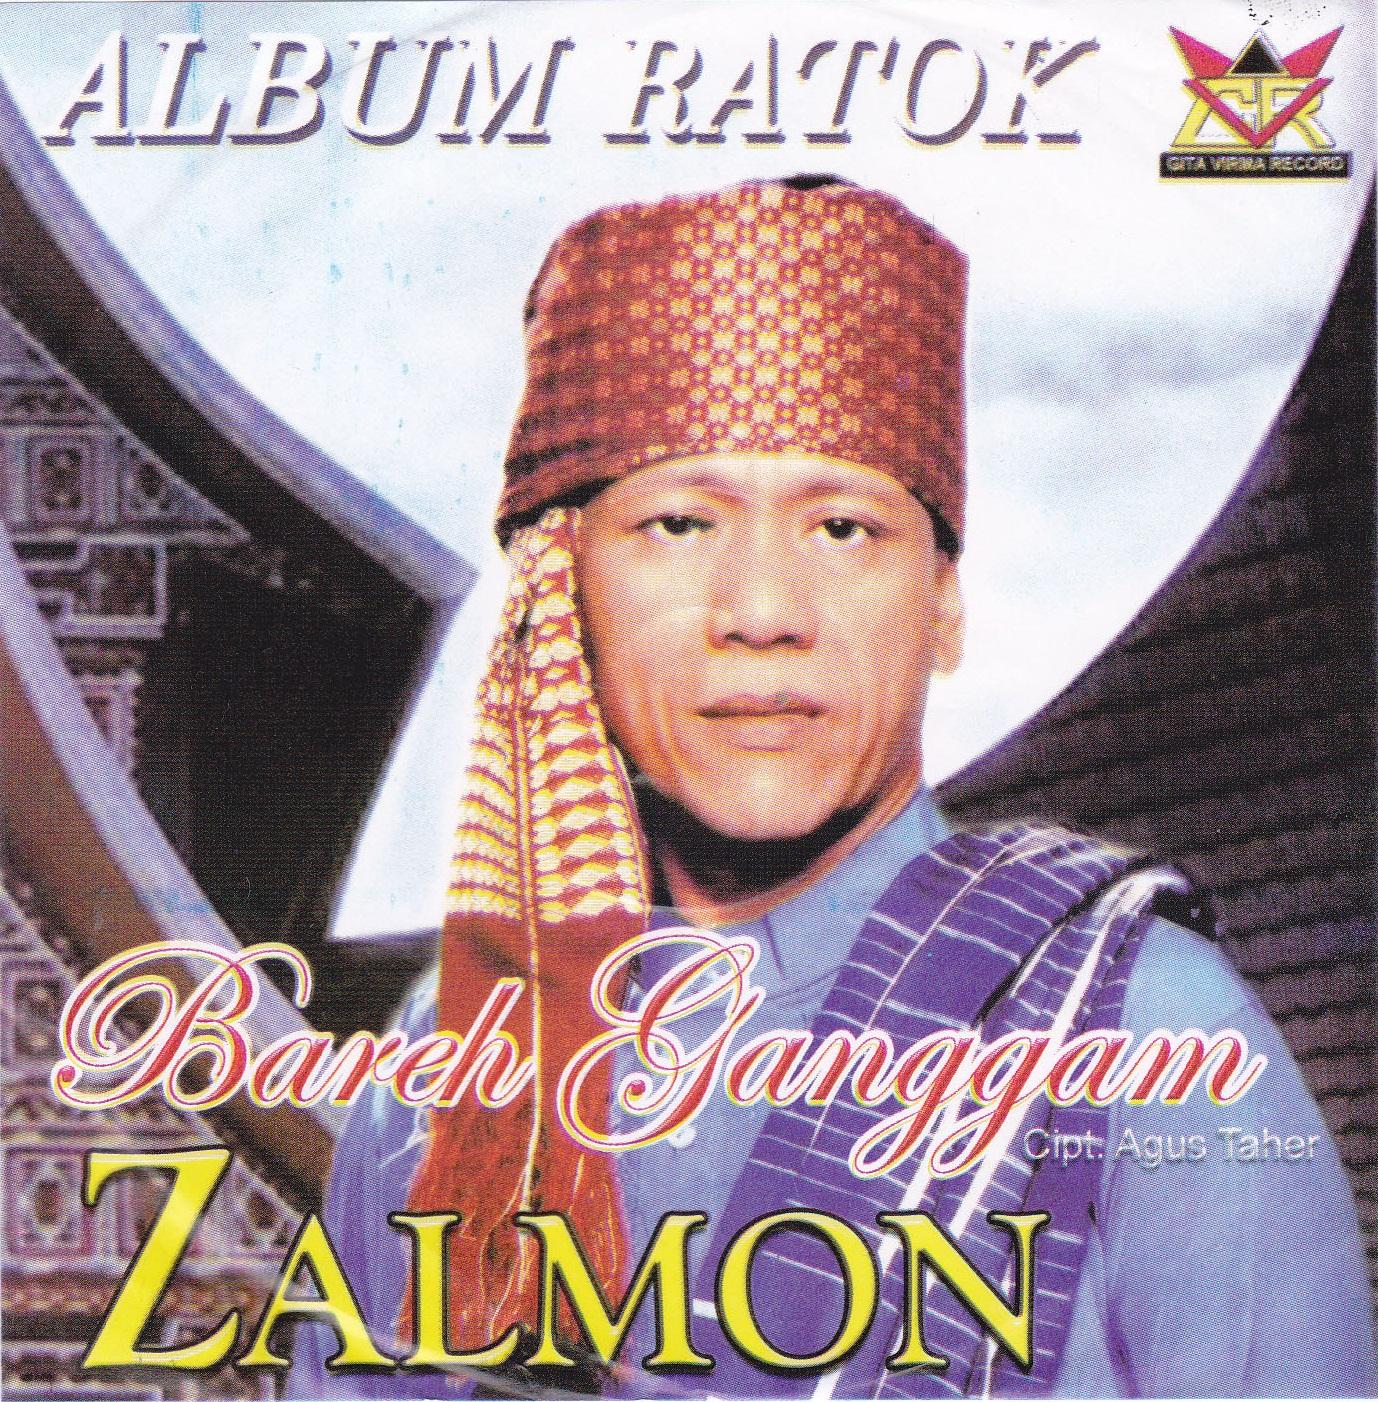 Download Lagu Goyang Nasi Padang 2: Zalmon - Album Ratok